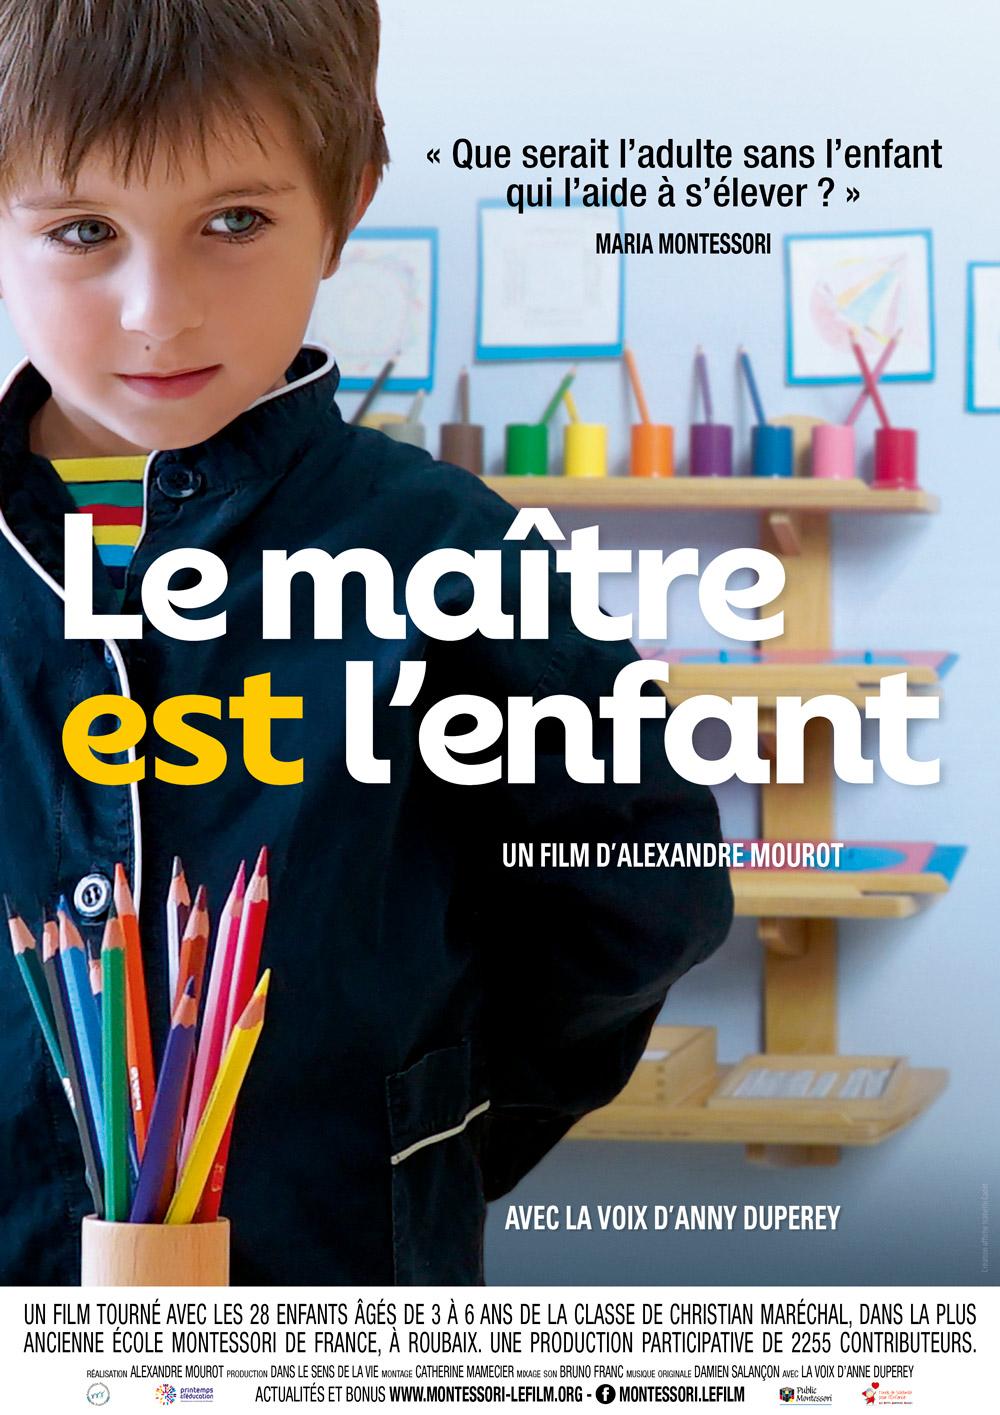 https://fr.web.img4.acsta.net/pictures/17/08/17/11/45/402124.jpg